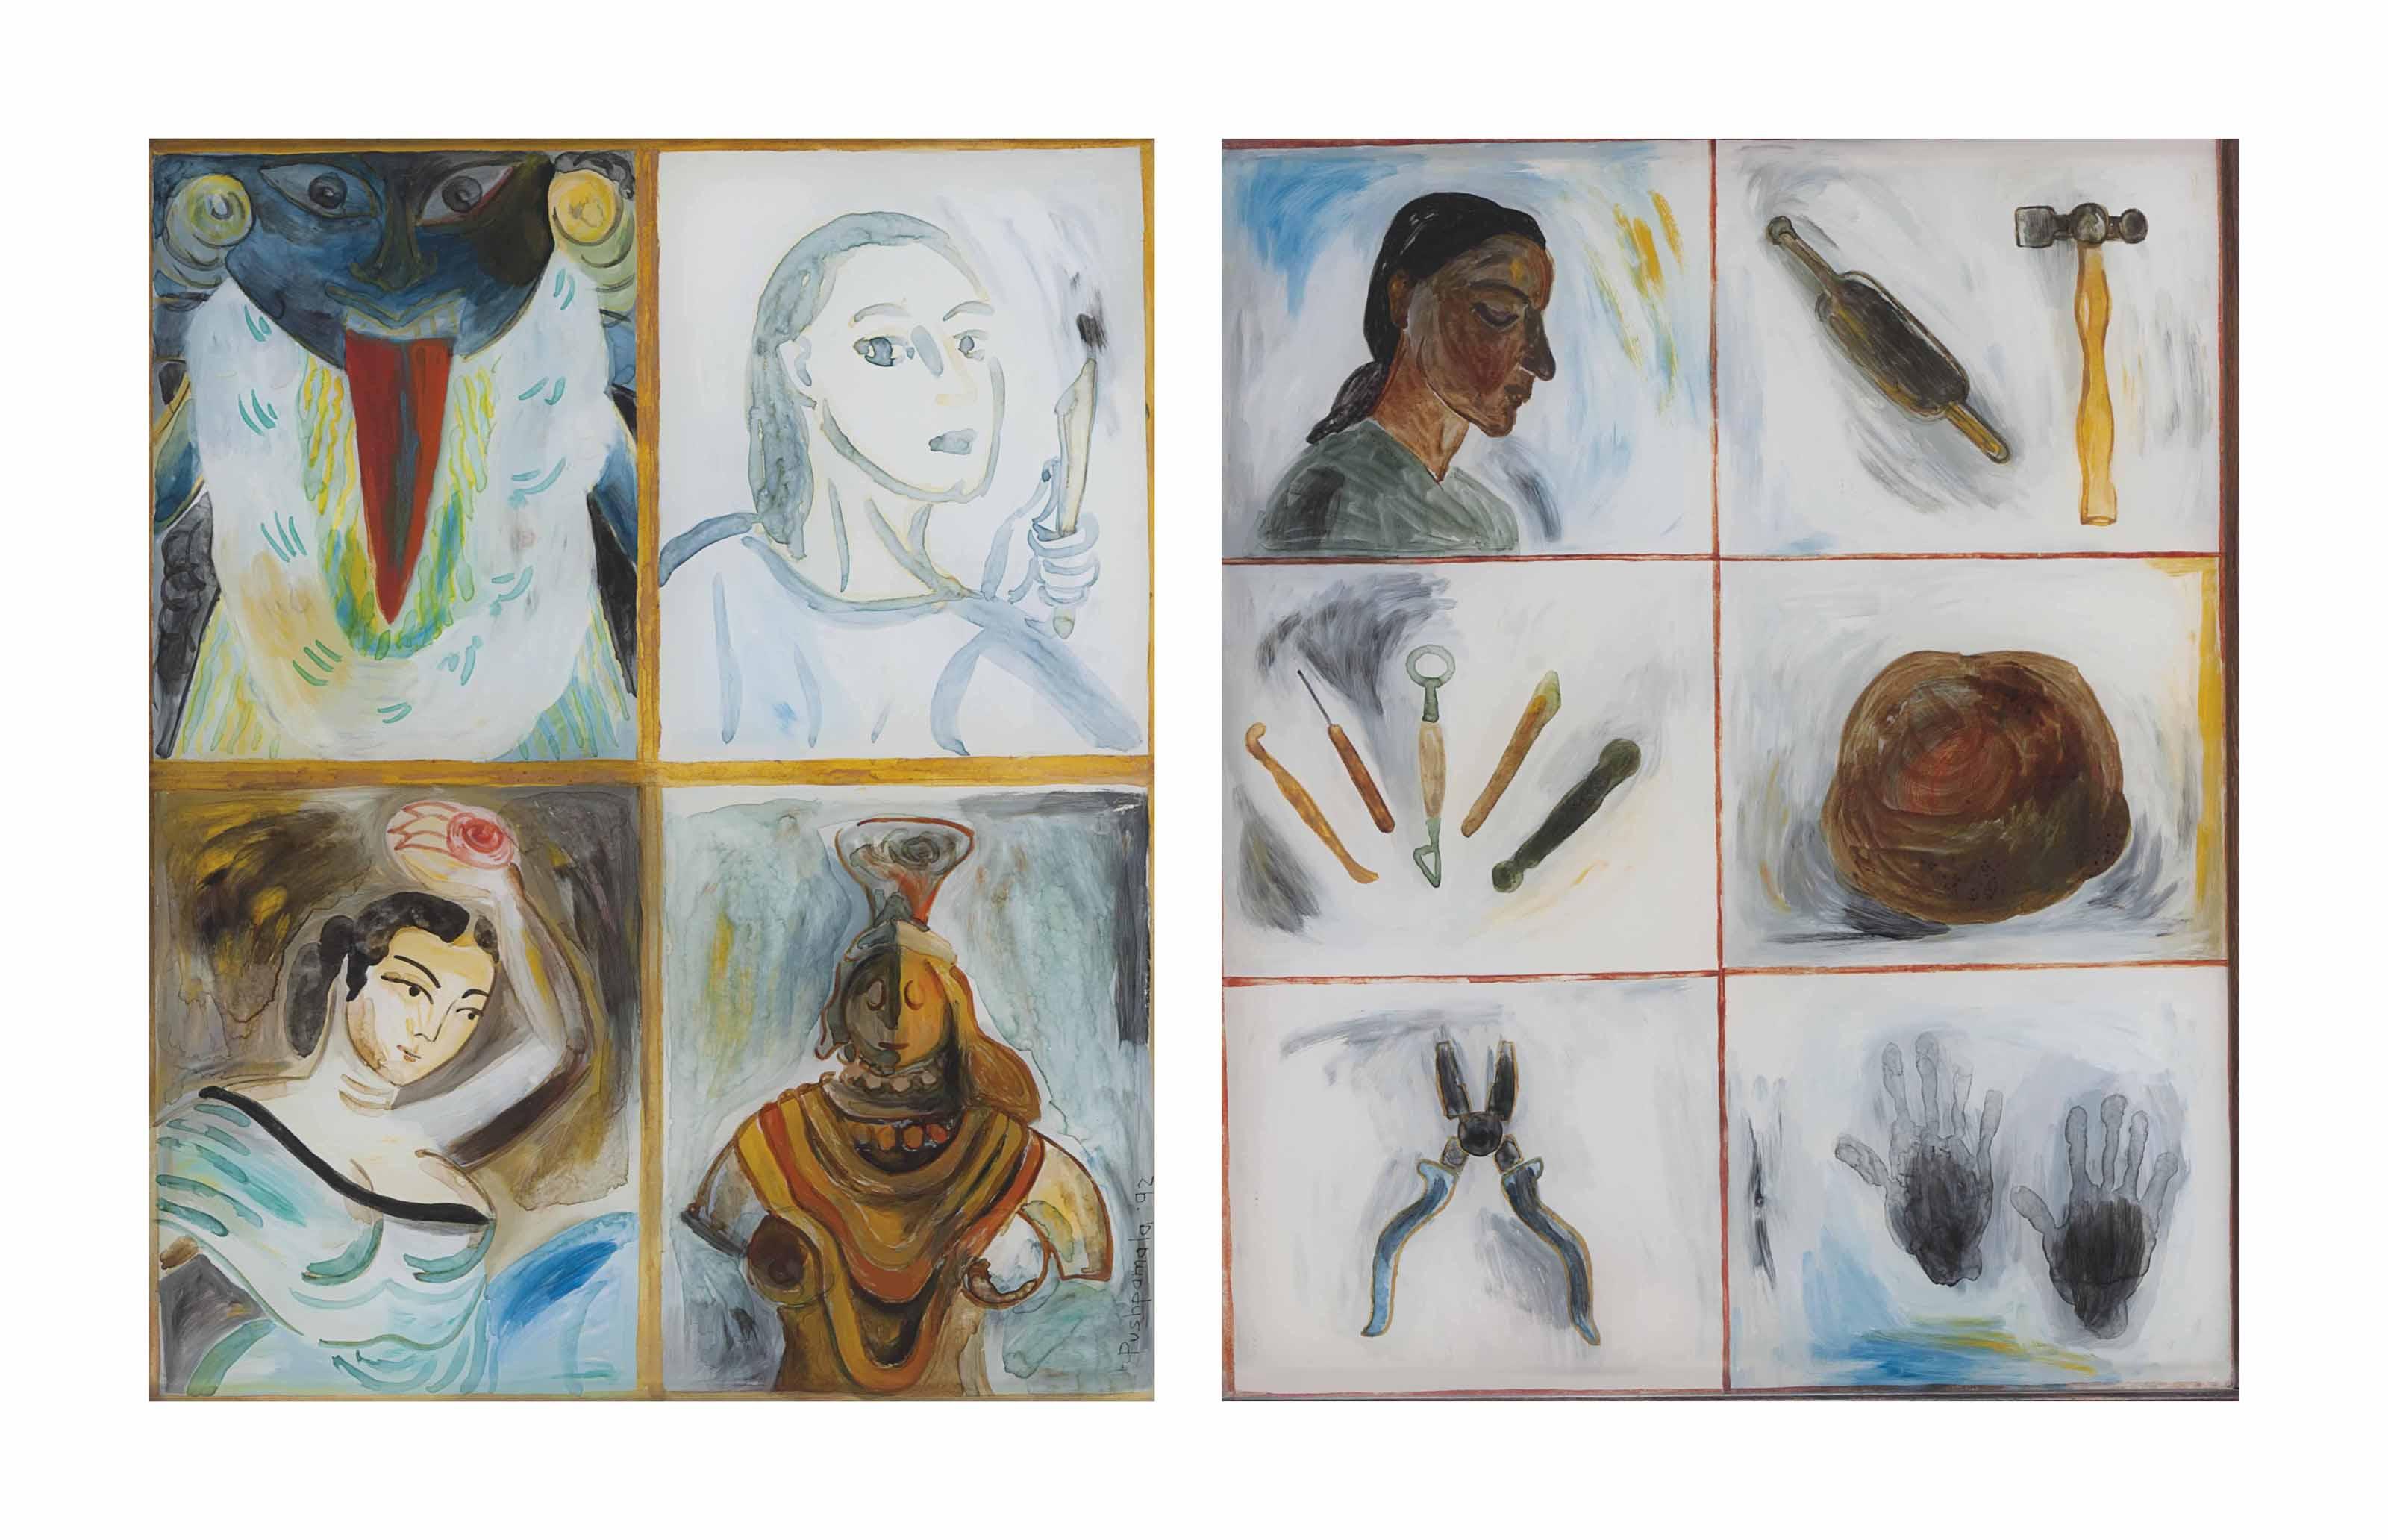 Untitled; Self Portrait: Artist and Tools